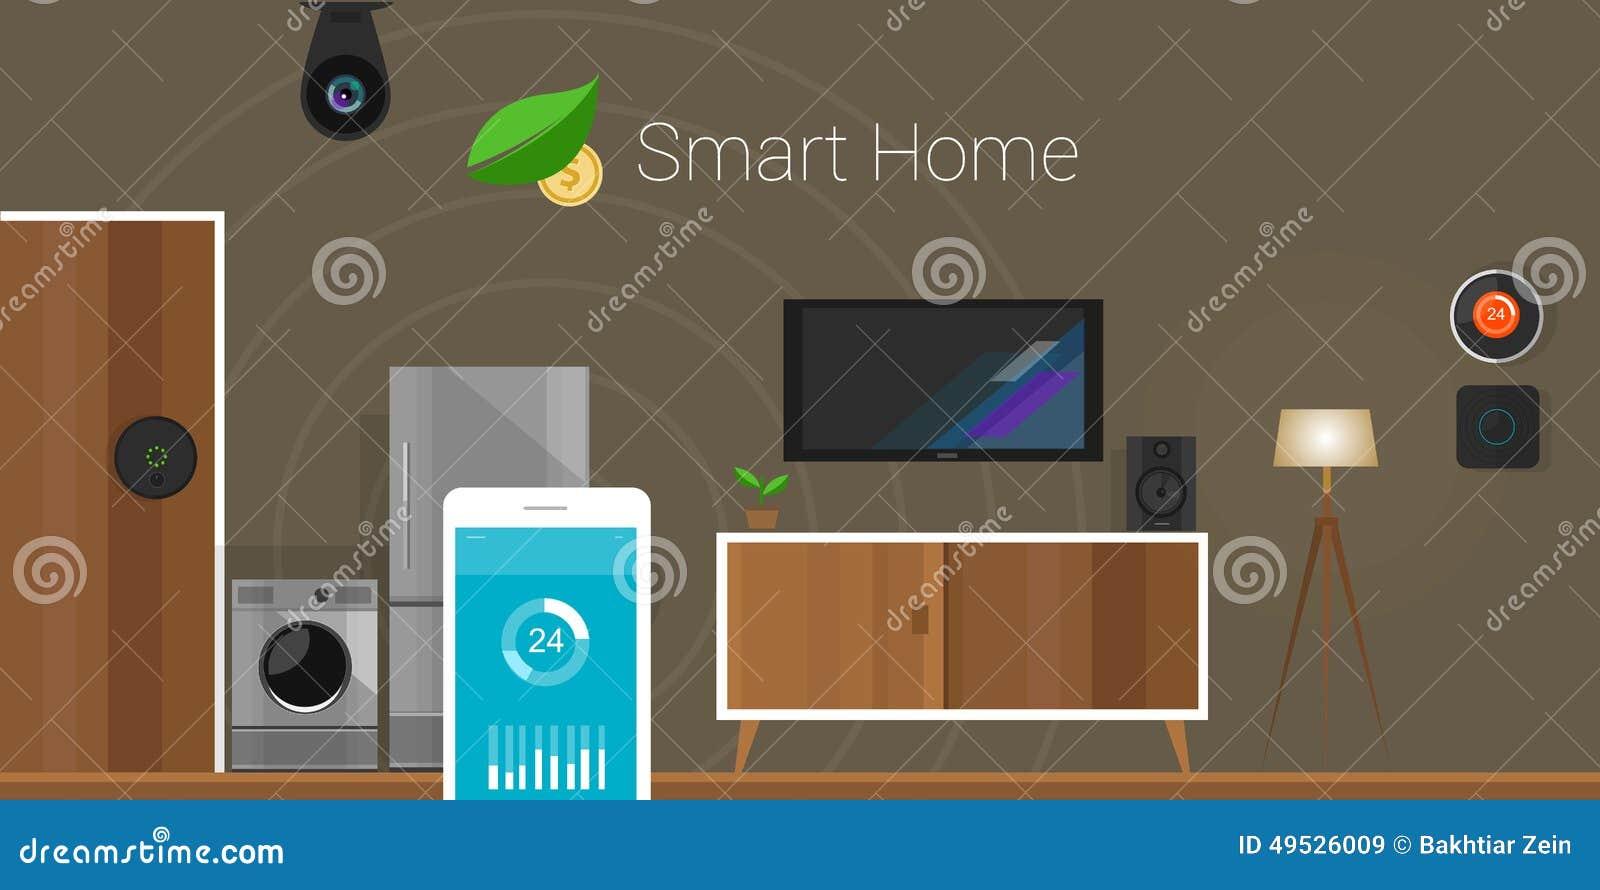 smart home internet of things stock illustration image 49526009. Black Bedroom Furniture Sets. Home Design Ideas